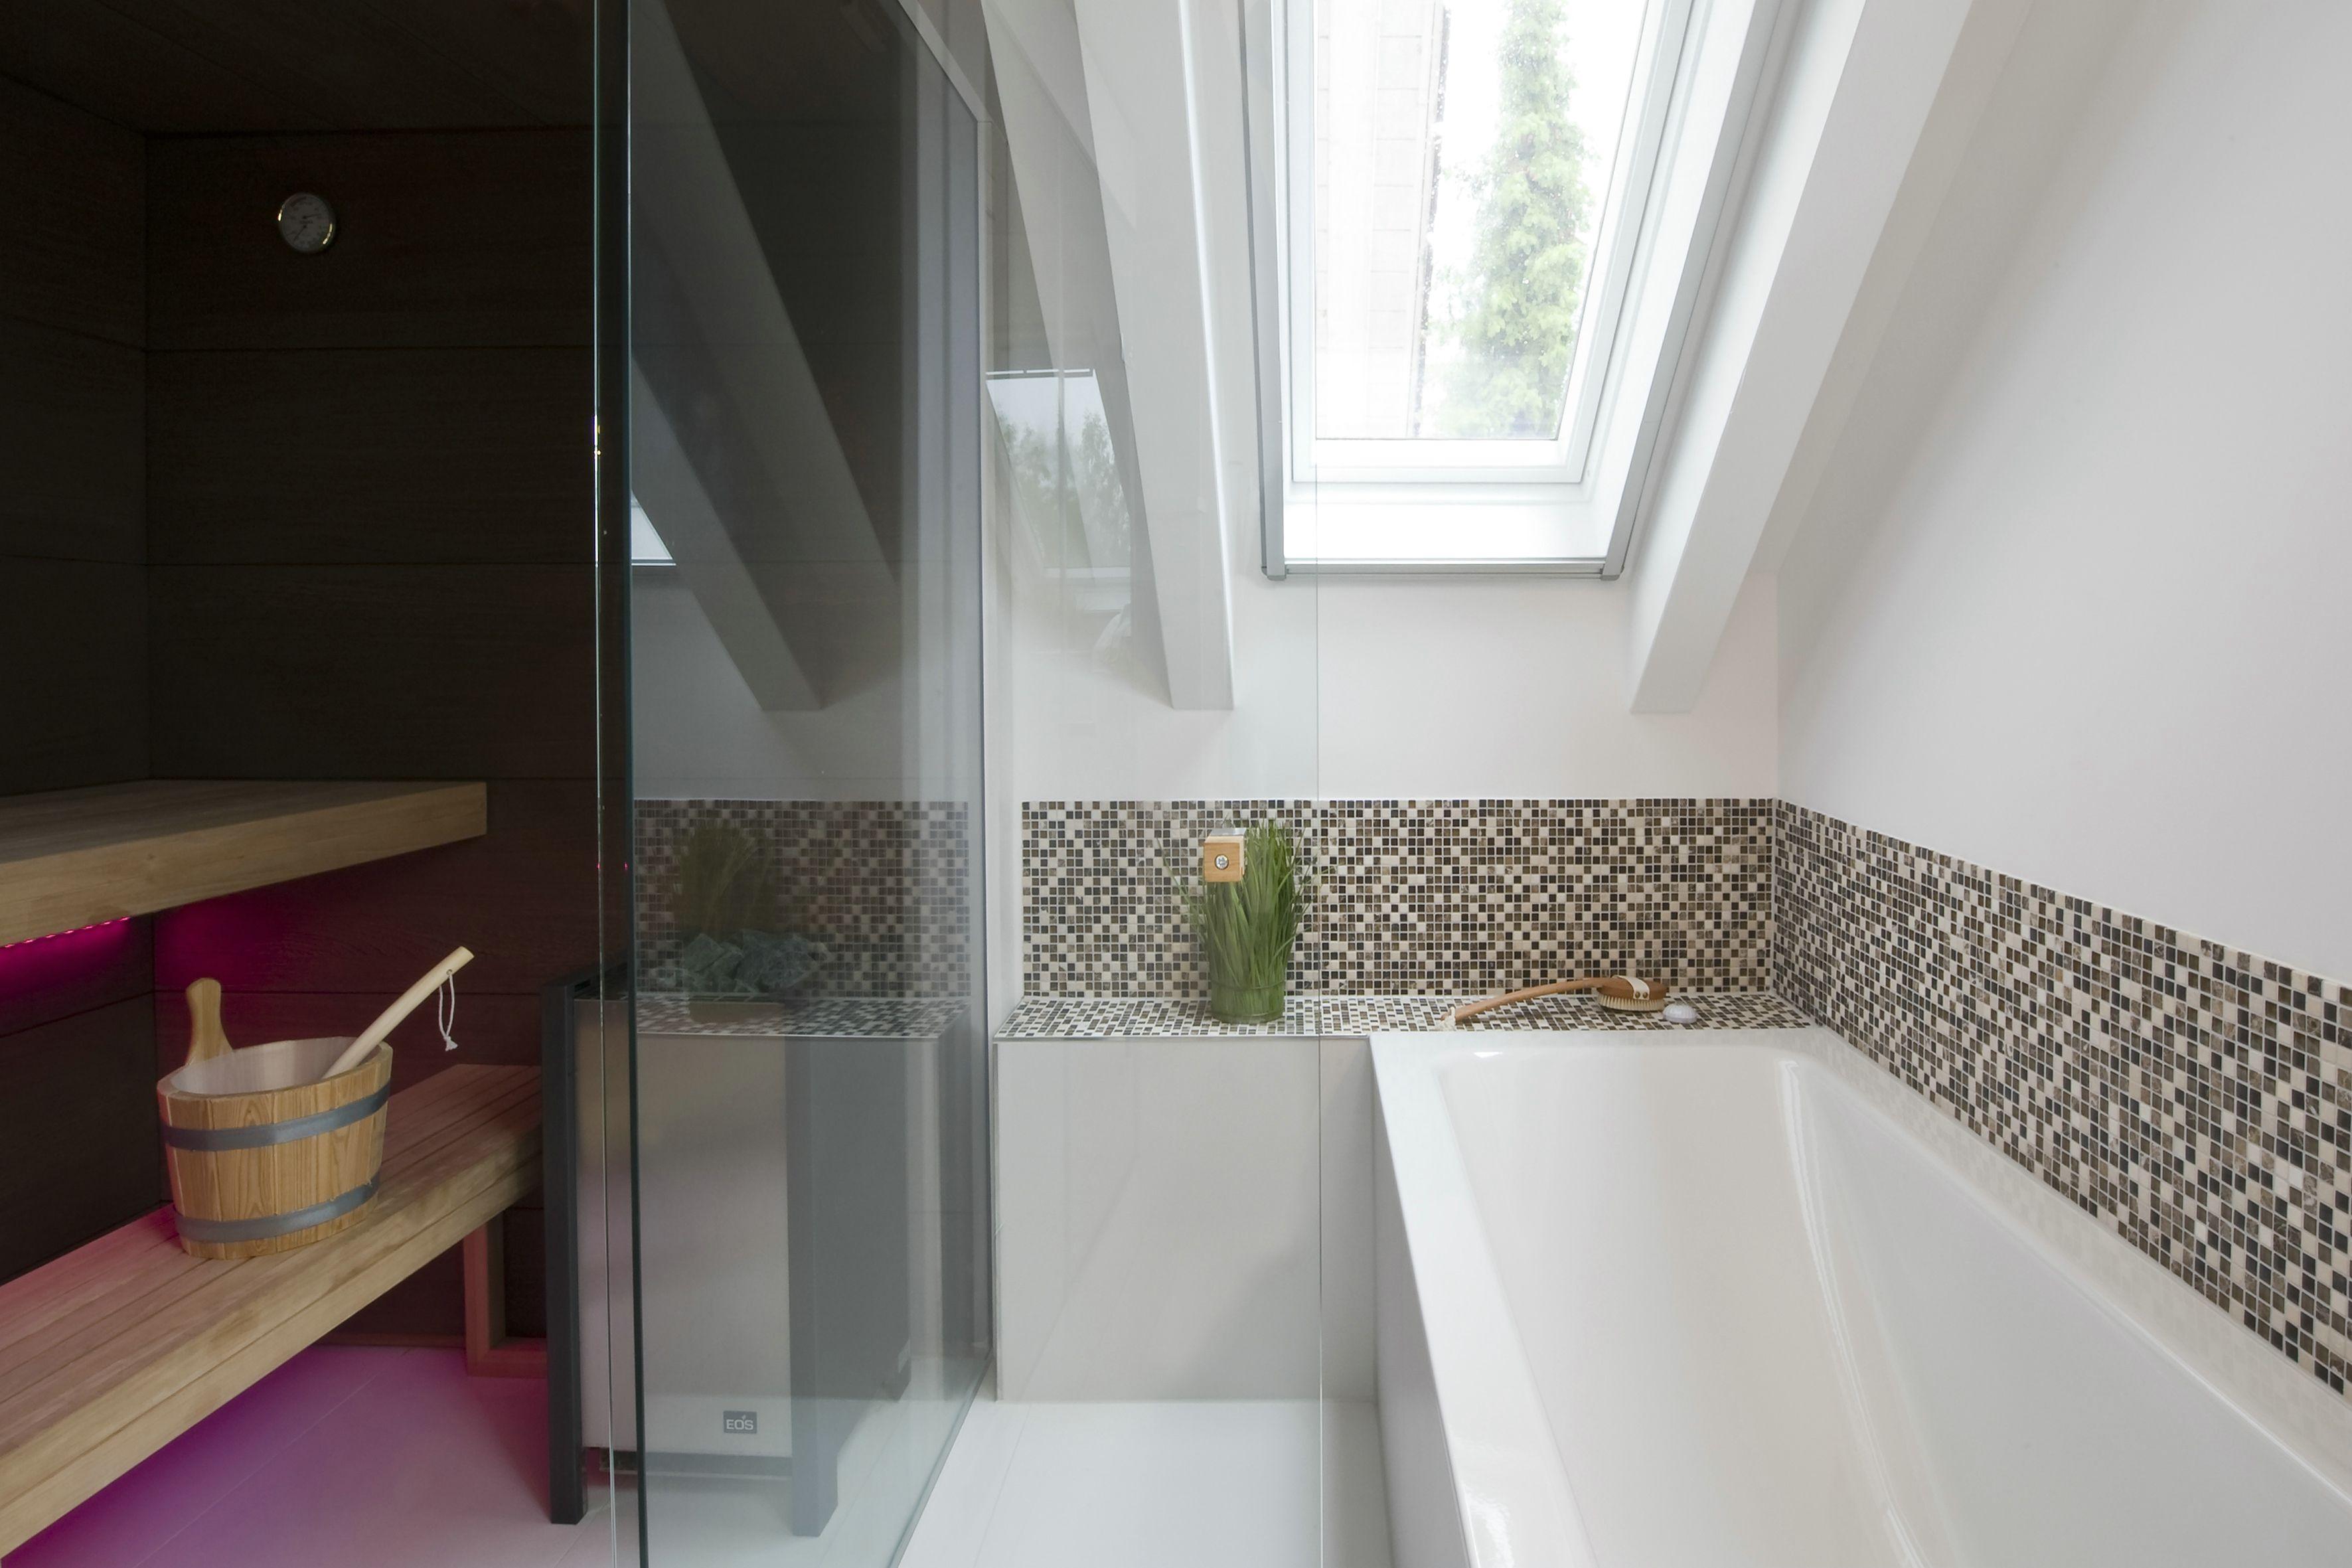 Wellness für Zuhause: Privates Spa im Dachgeschoss  Badezimmer